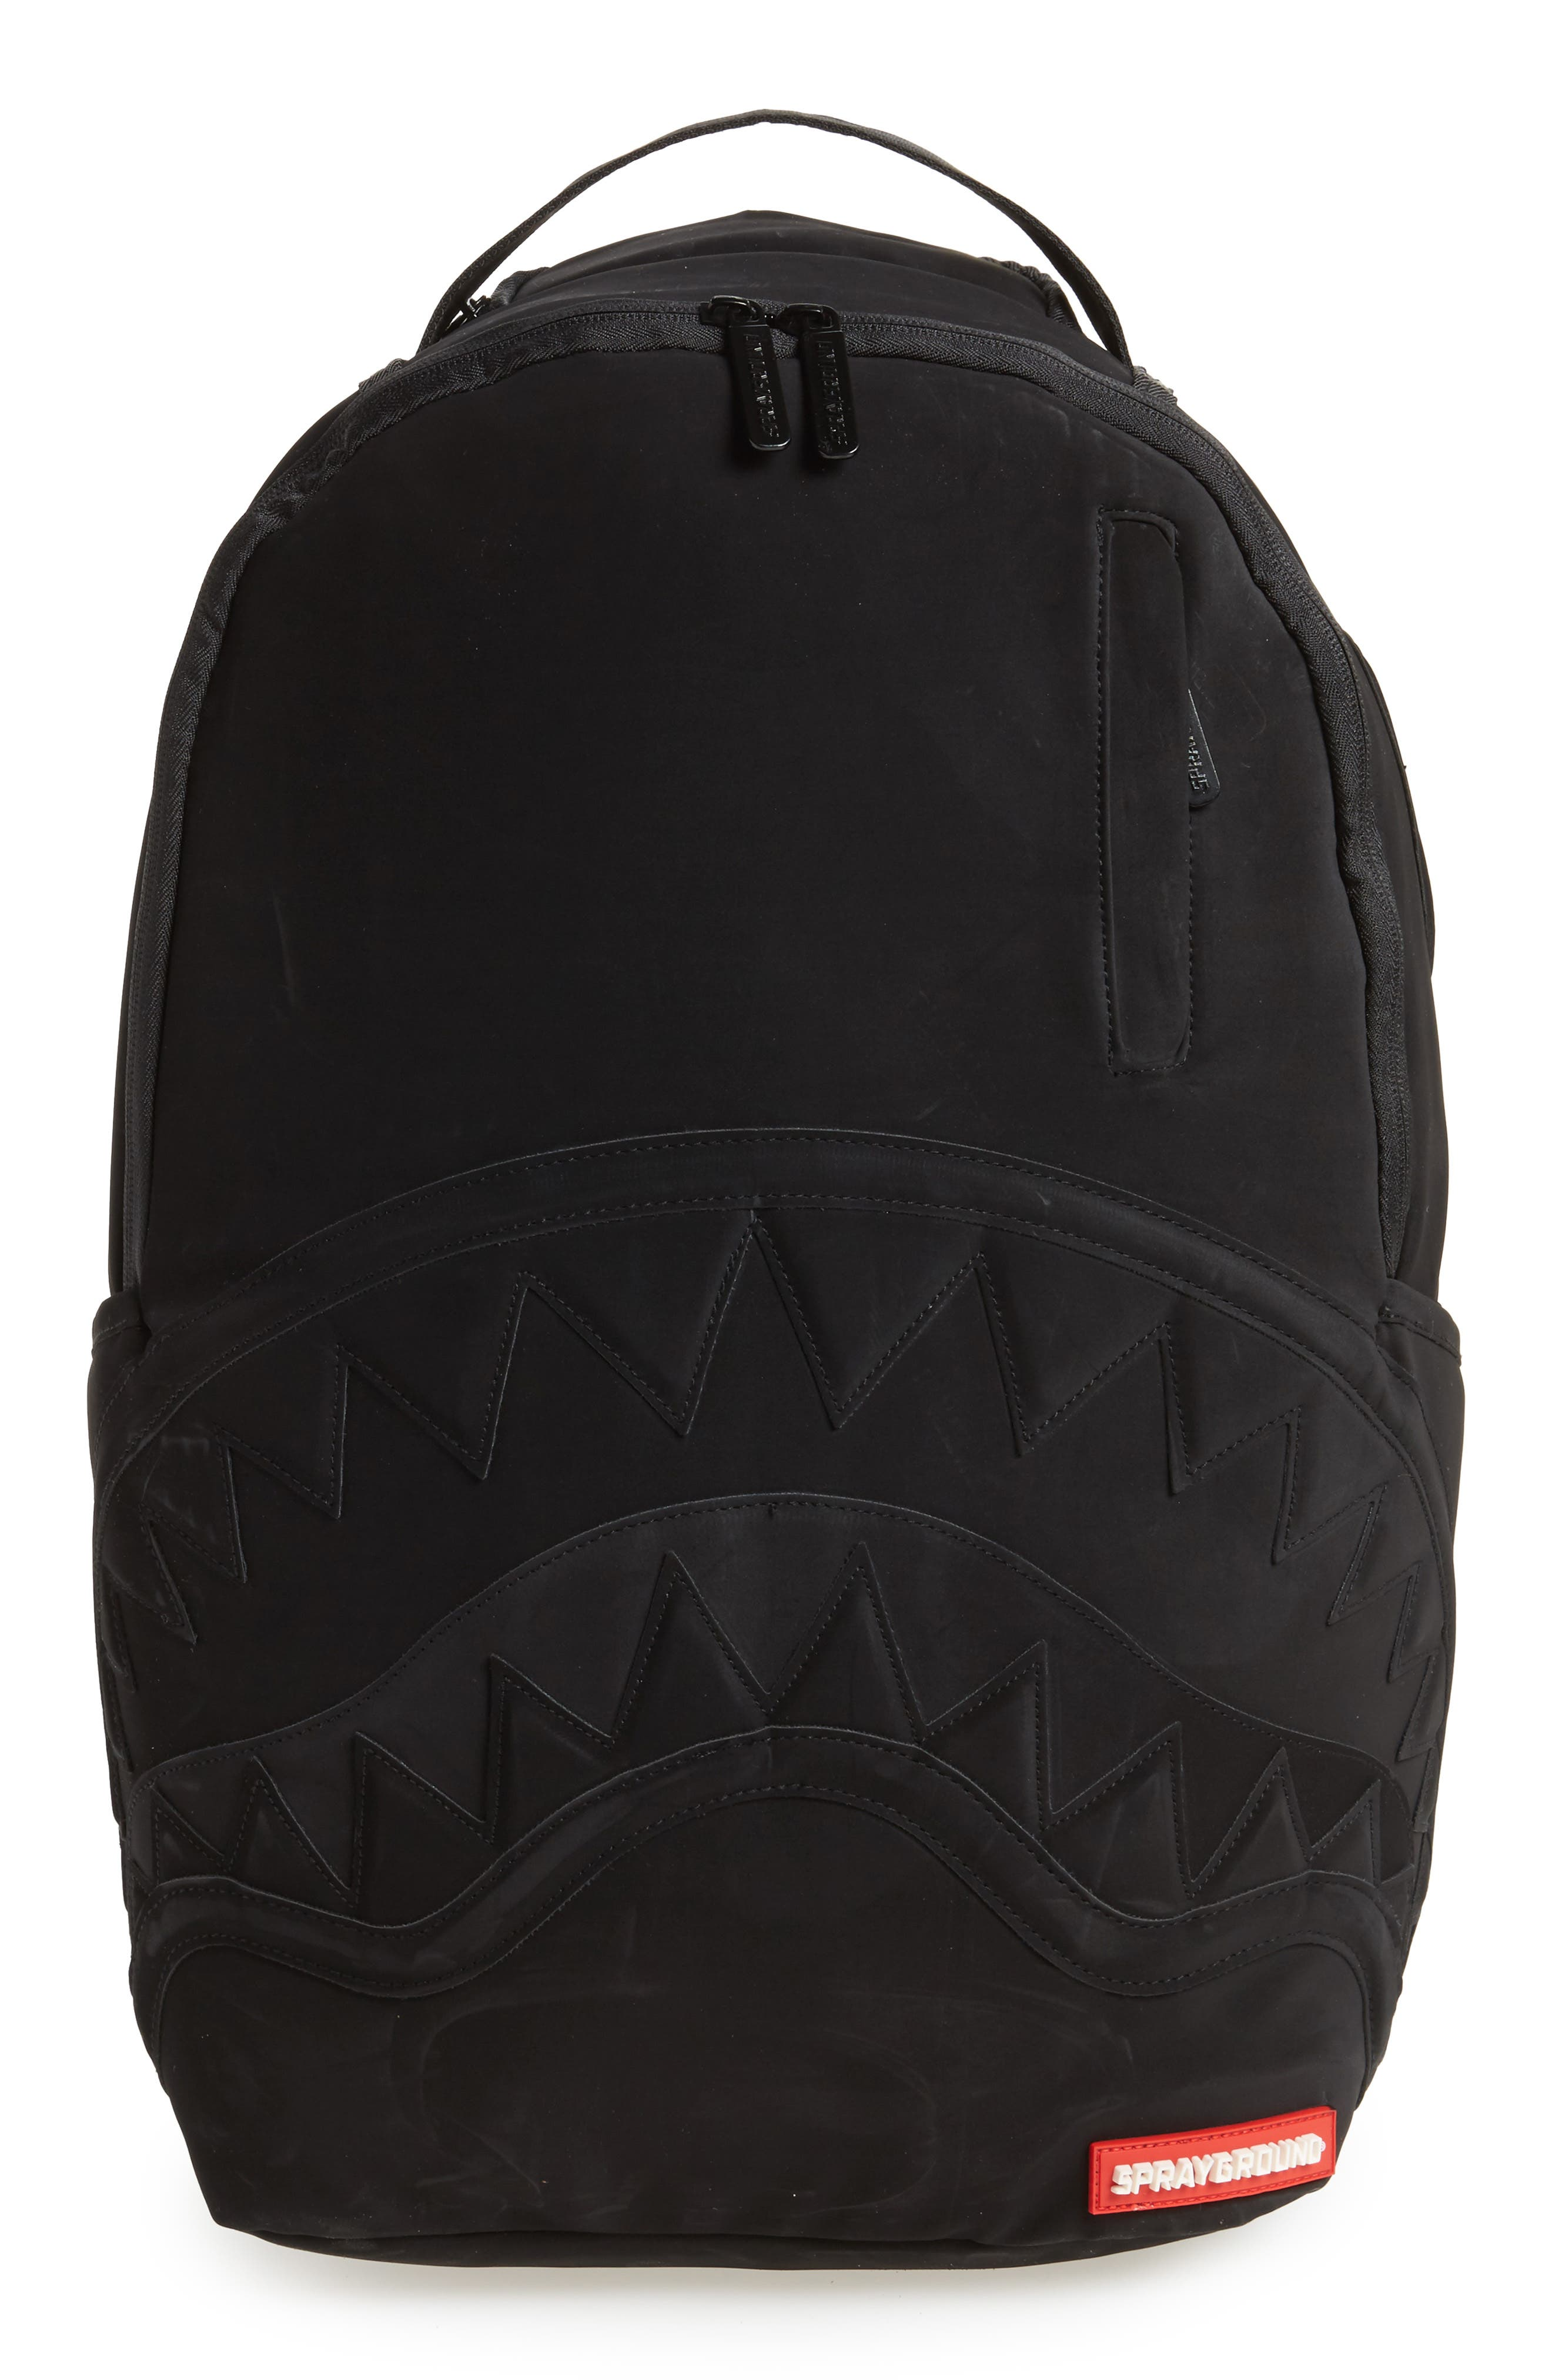 Ghost Shark Backpack,                             Main thumbnail 1, color,                             Black